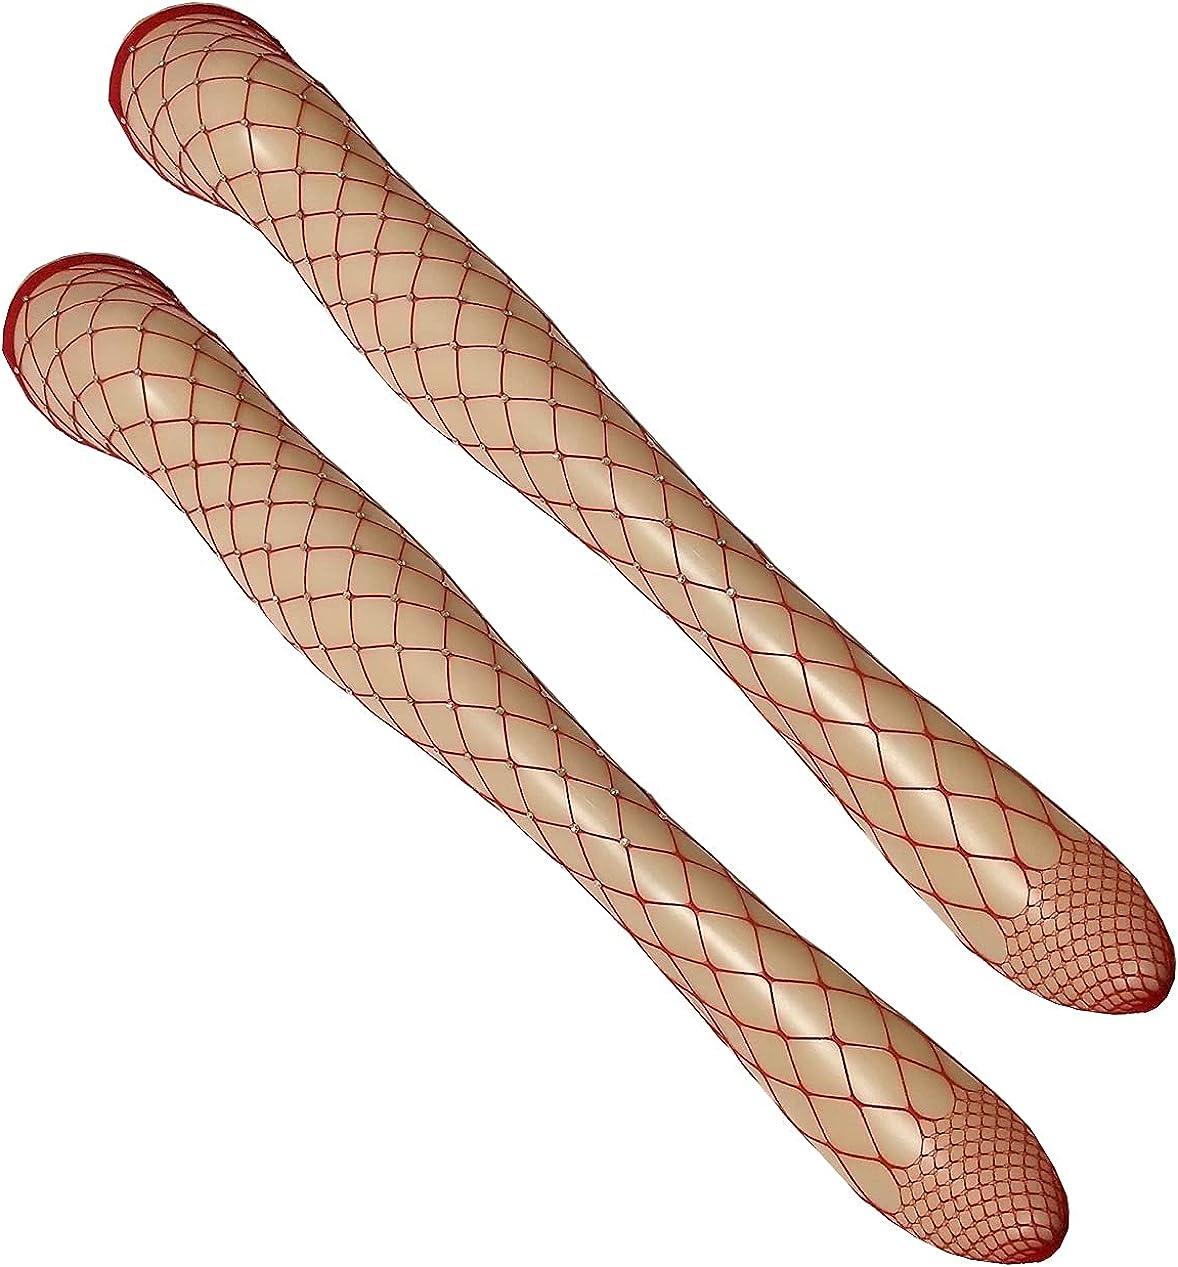 Mrotrida Women's Fishnet High Stockings Rhinestone Mesh Elastic Stockings Shiny Sexy Transparent Nylon Tights Pantyhose